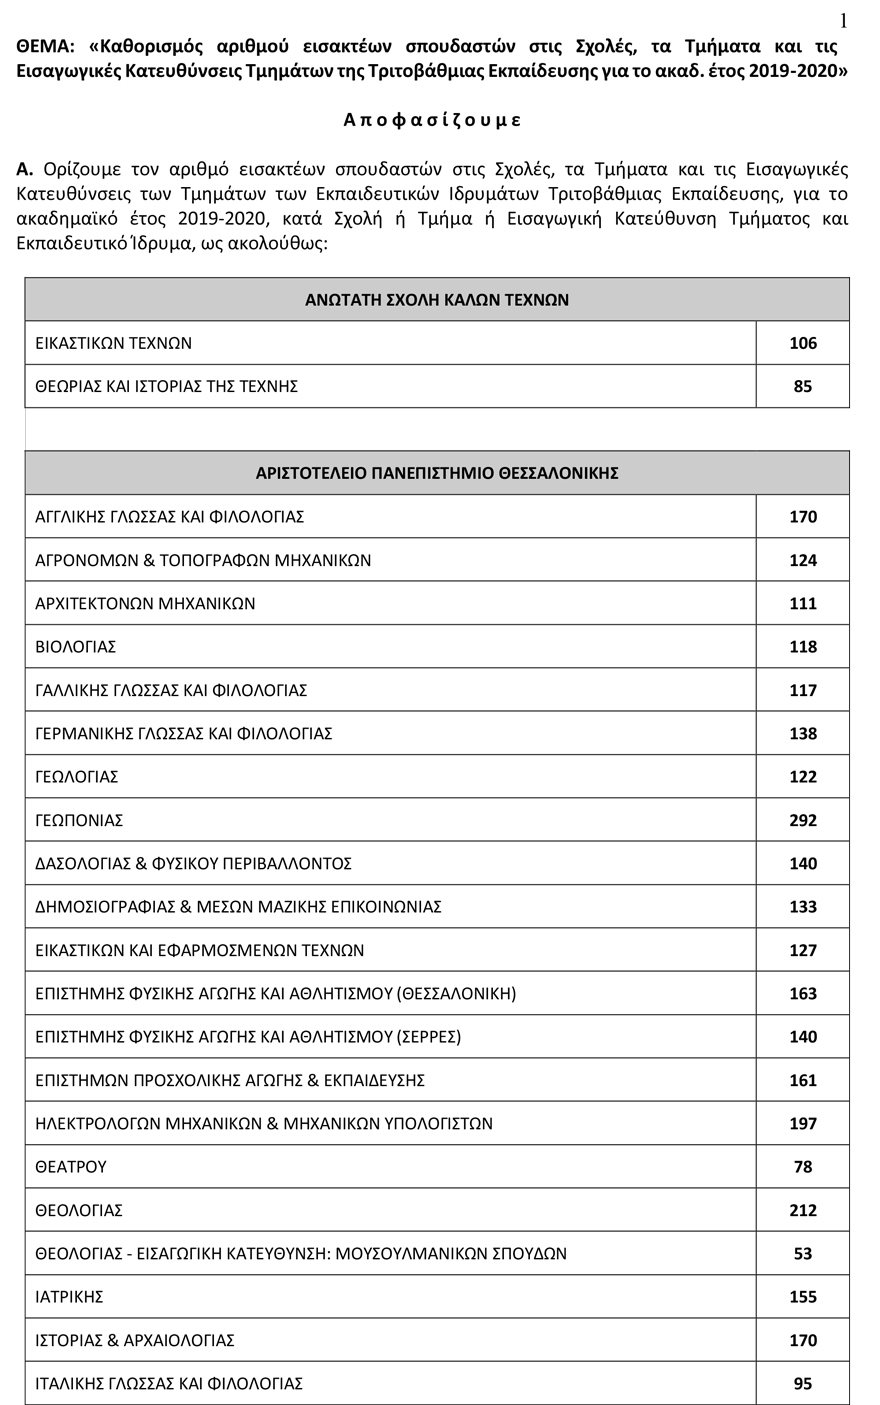 arrithmos_eisakt1 78.335 θα εισαχθούν φέτος στα Πανεπιστήμια - Αυξημένος κατά 3.500 ο αριθμός